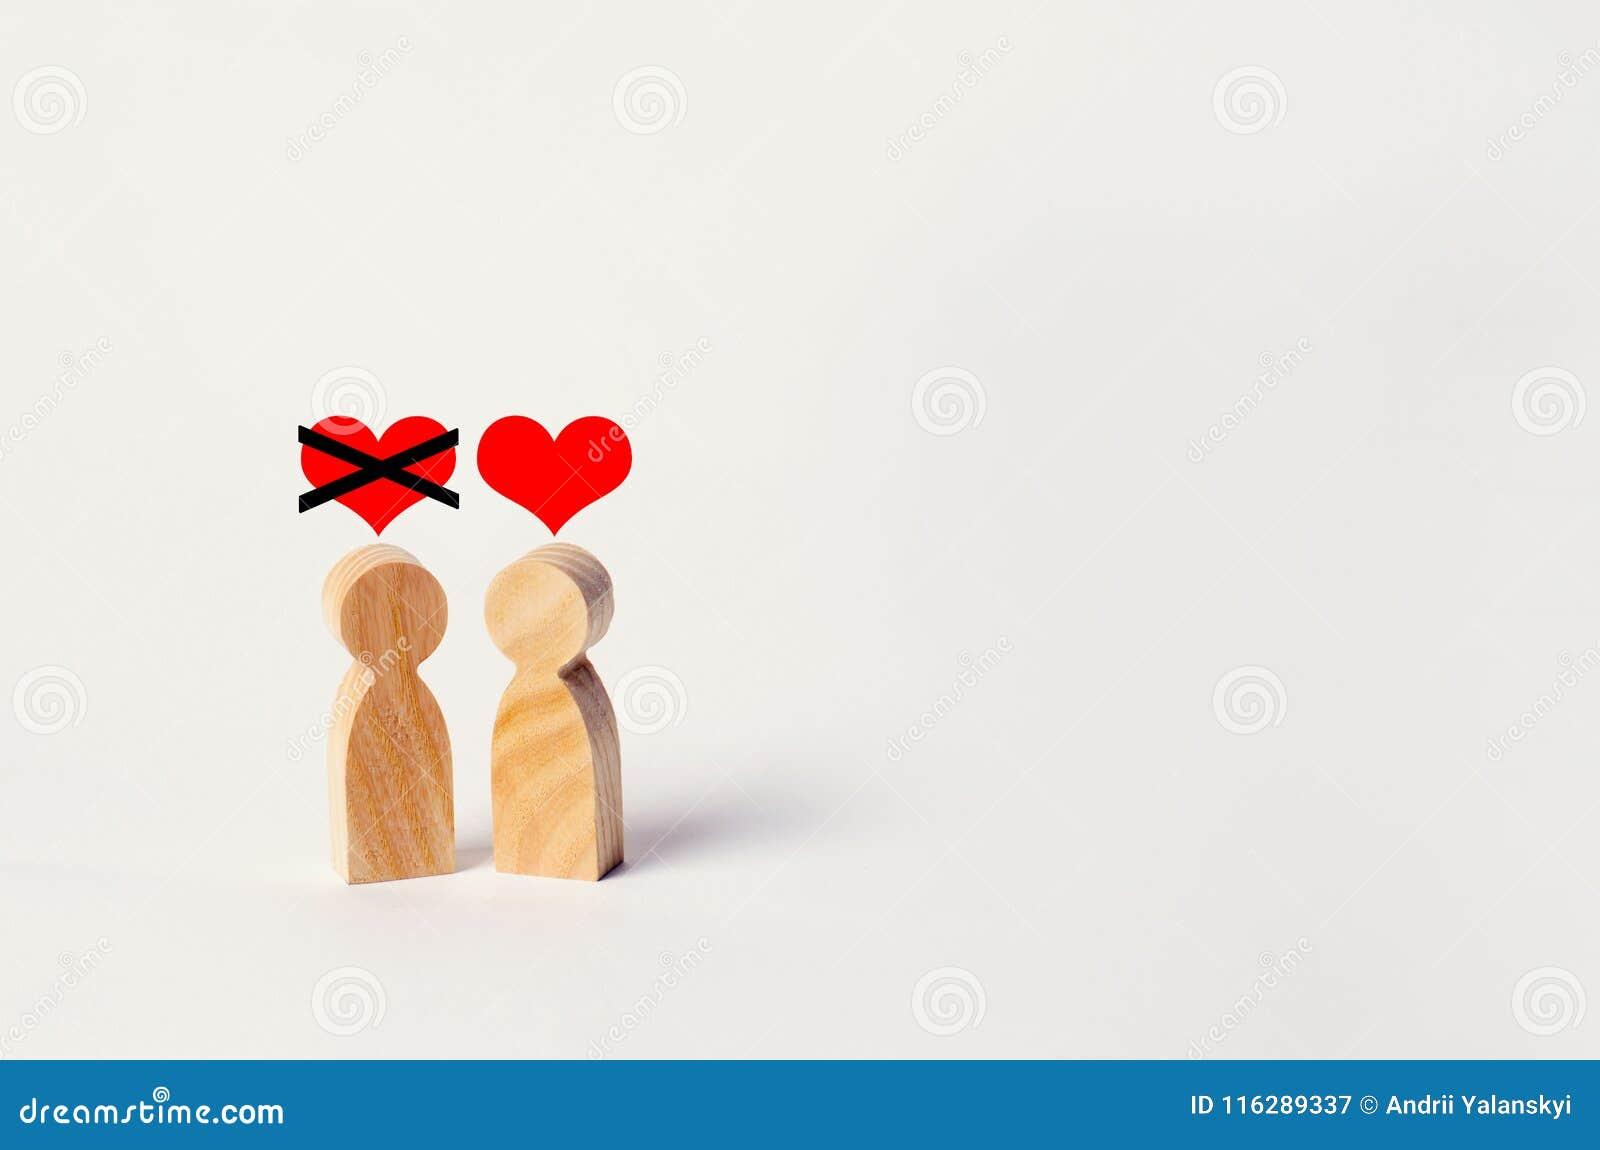 Capricorn woman and gemini woman friendship